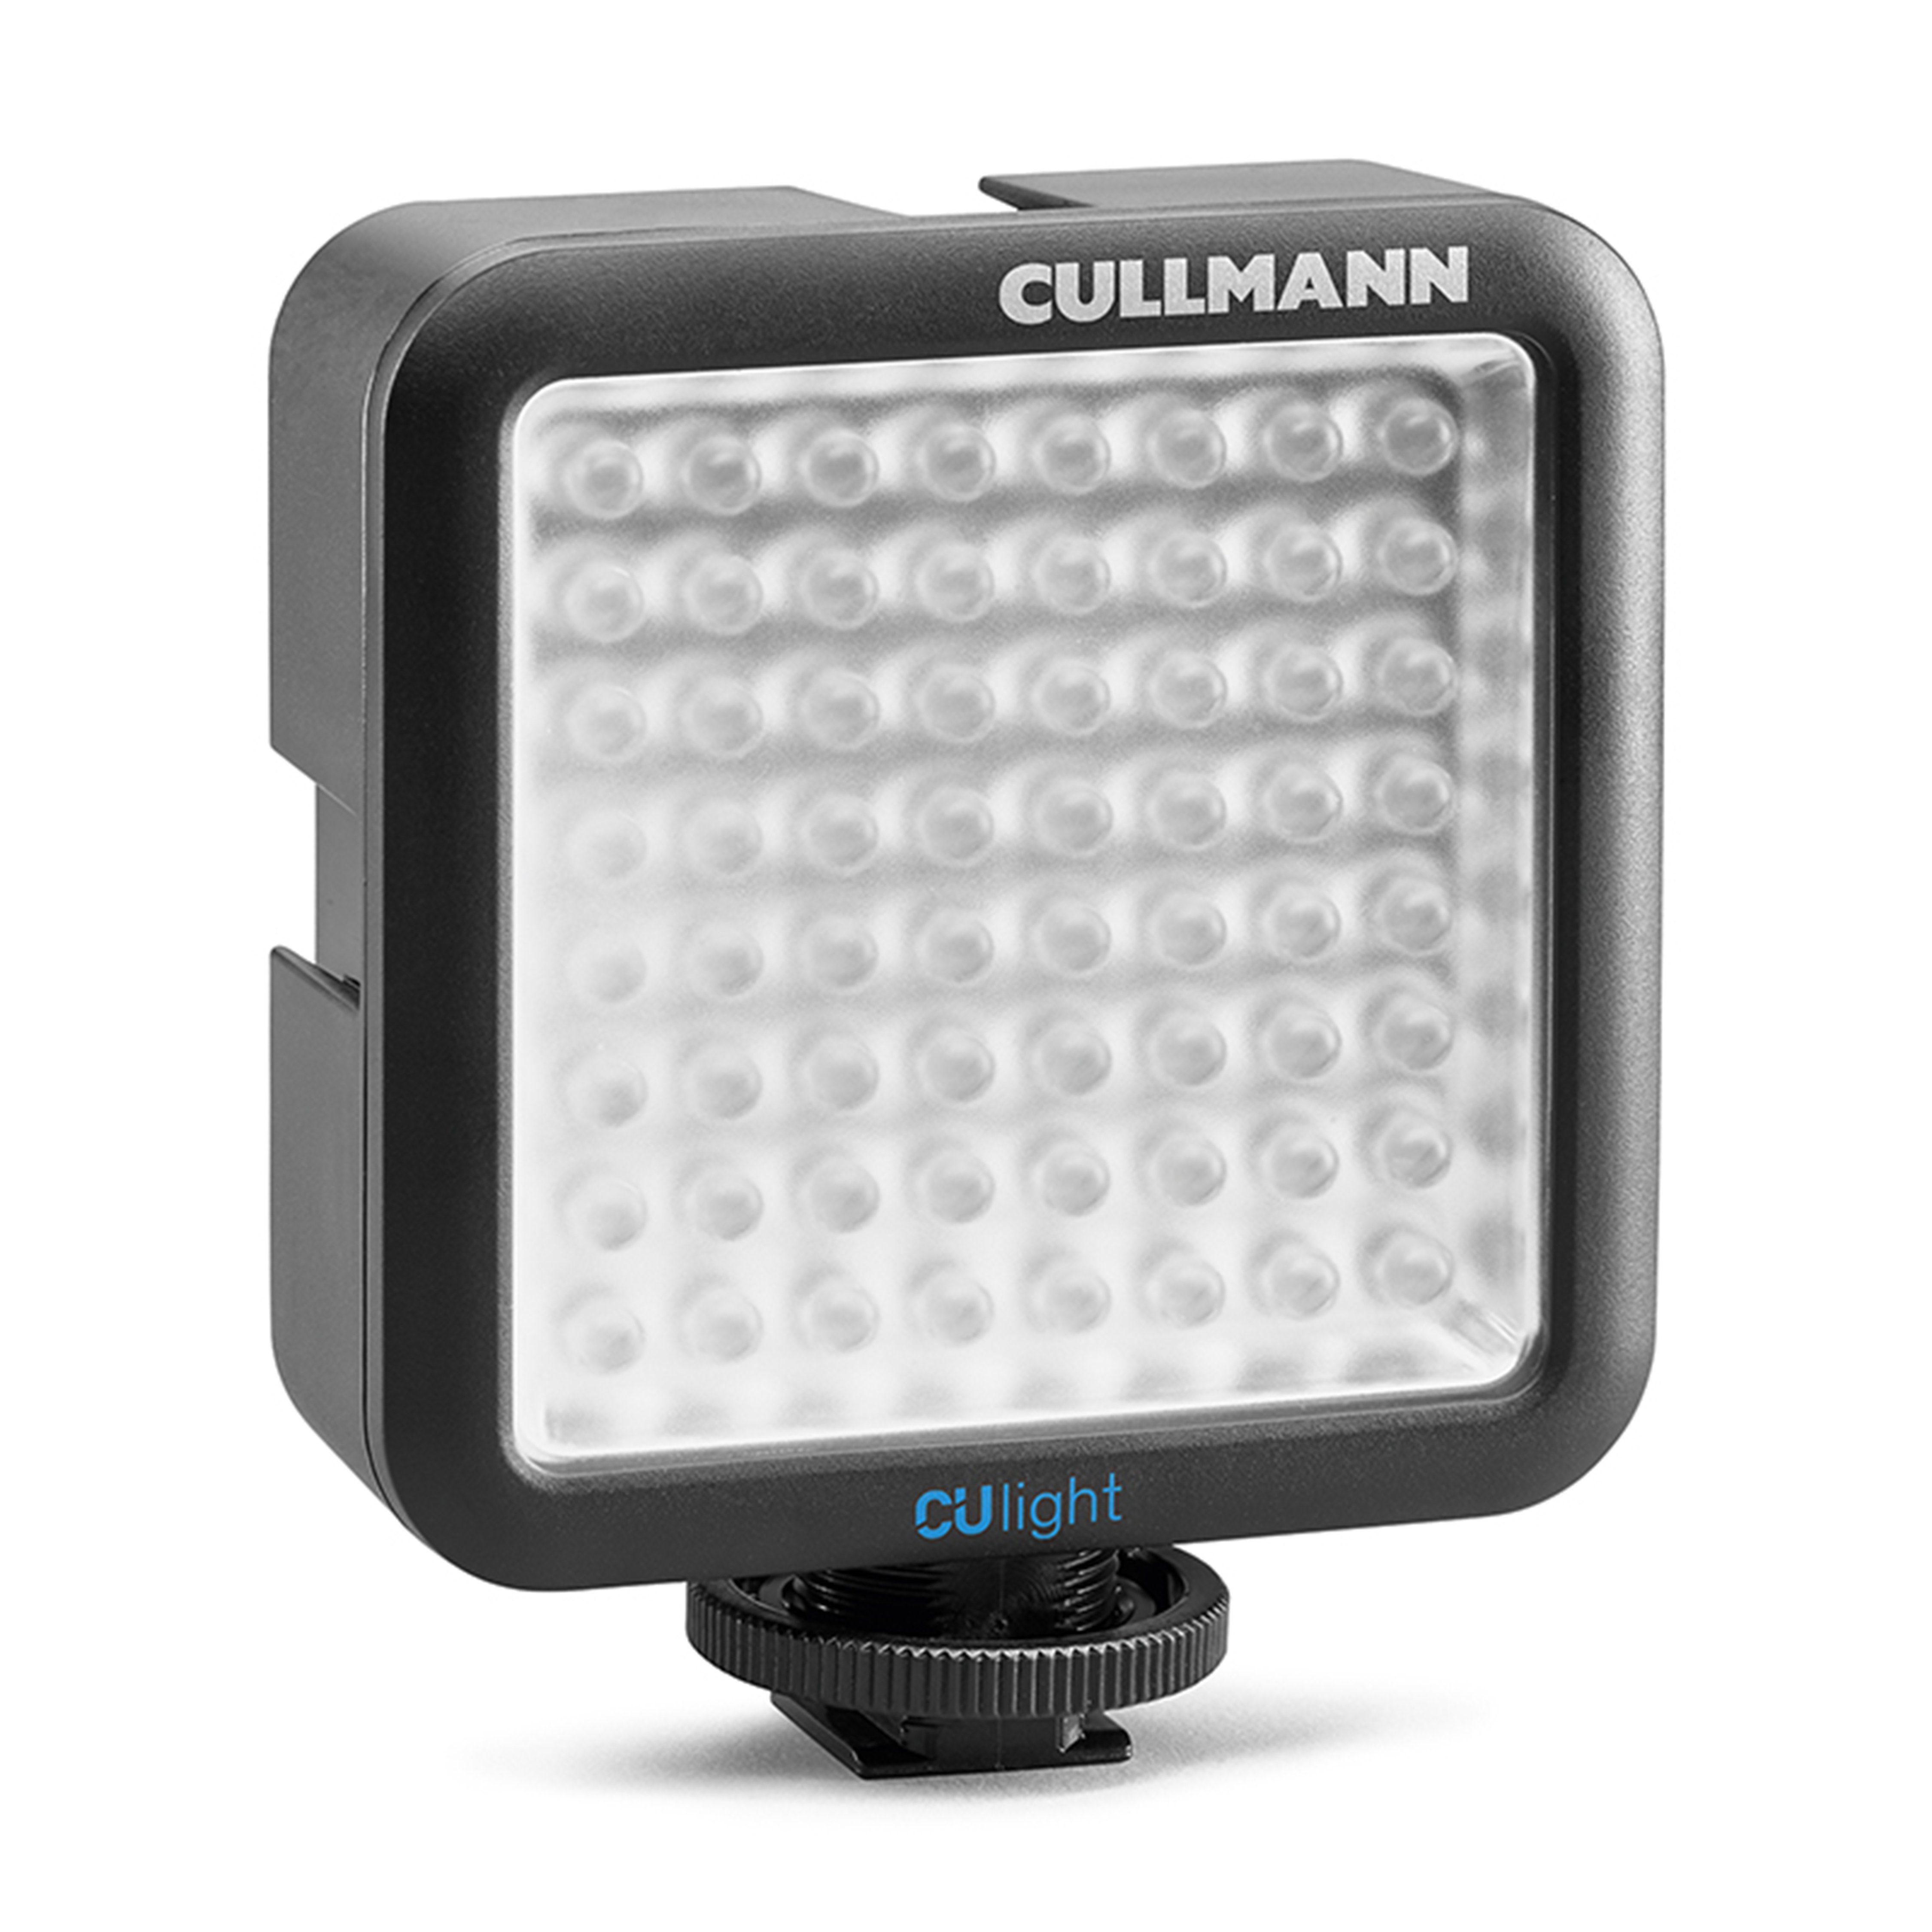 Cullmann LED-Videoleuchte, Tageslicht, 220 Lux / 5600 Kelvin »Culight V 220DL«